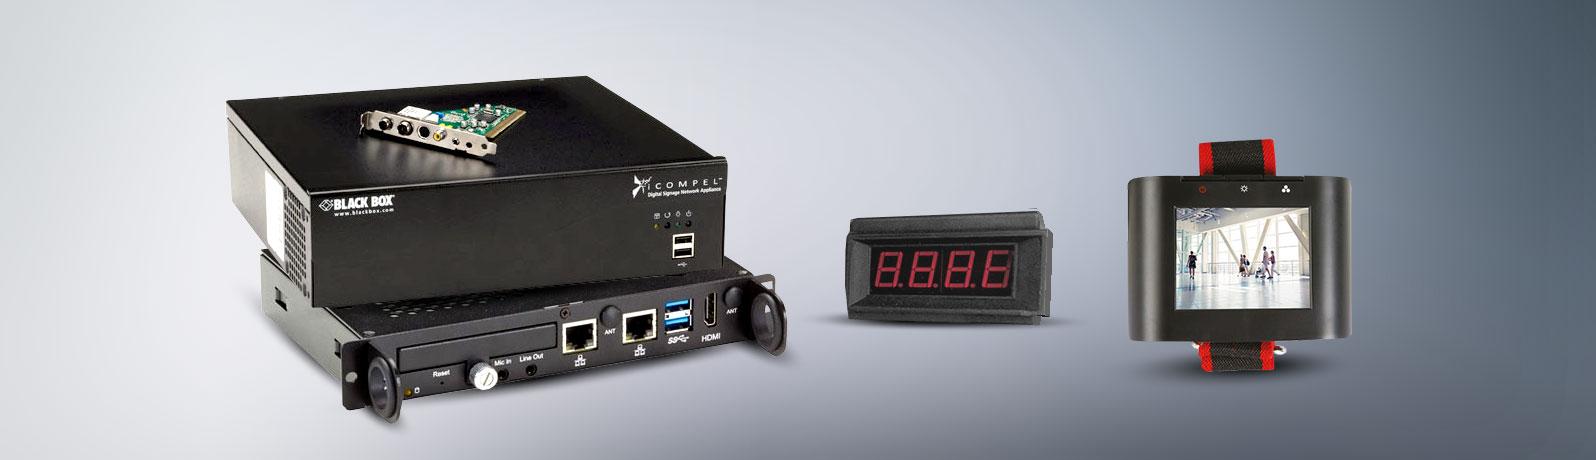 Digital Signage Equipment